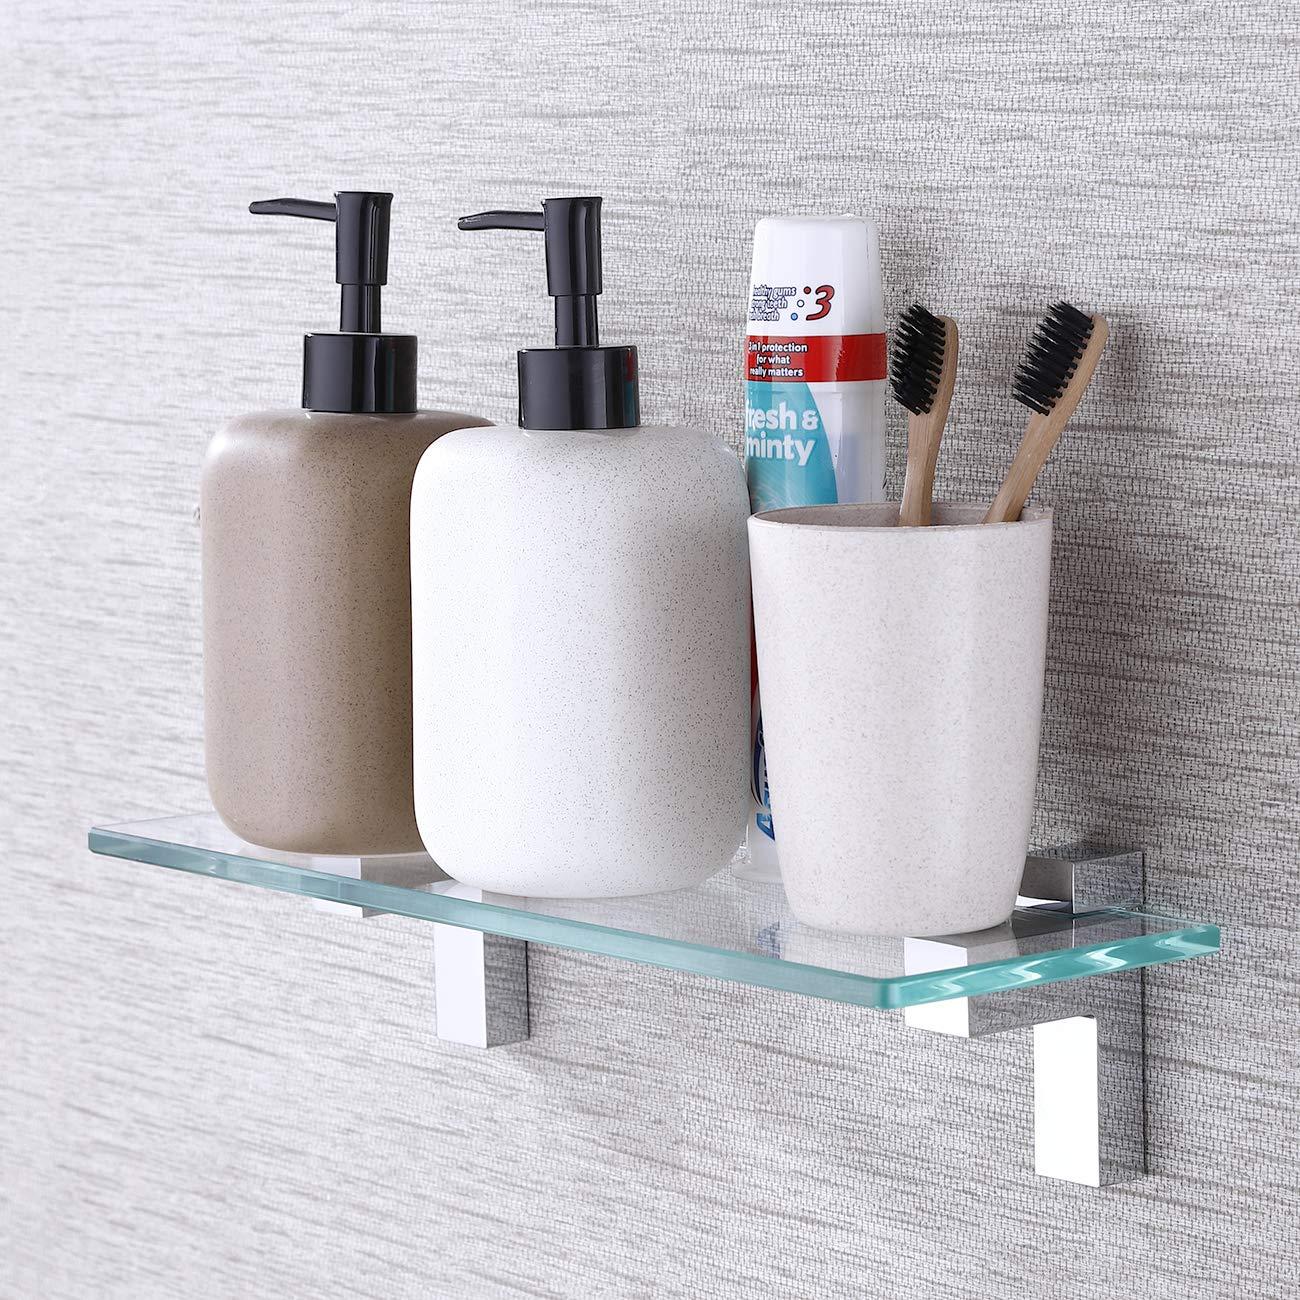 BGS3201S35 Polished Chrome Bracket KES Bathroom Tempered Glass Shelf 14 8MM-Thick Wall Mount Rectangular